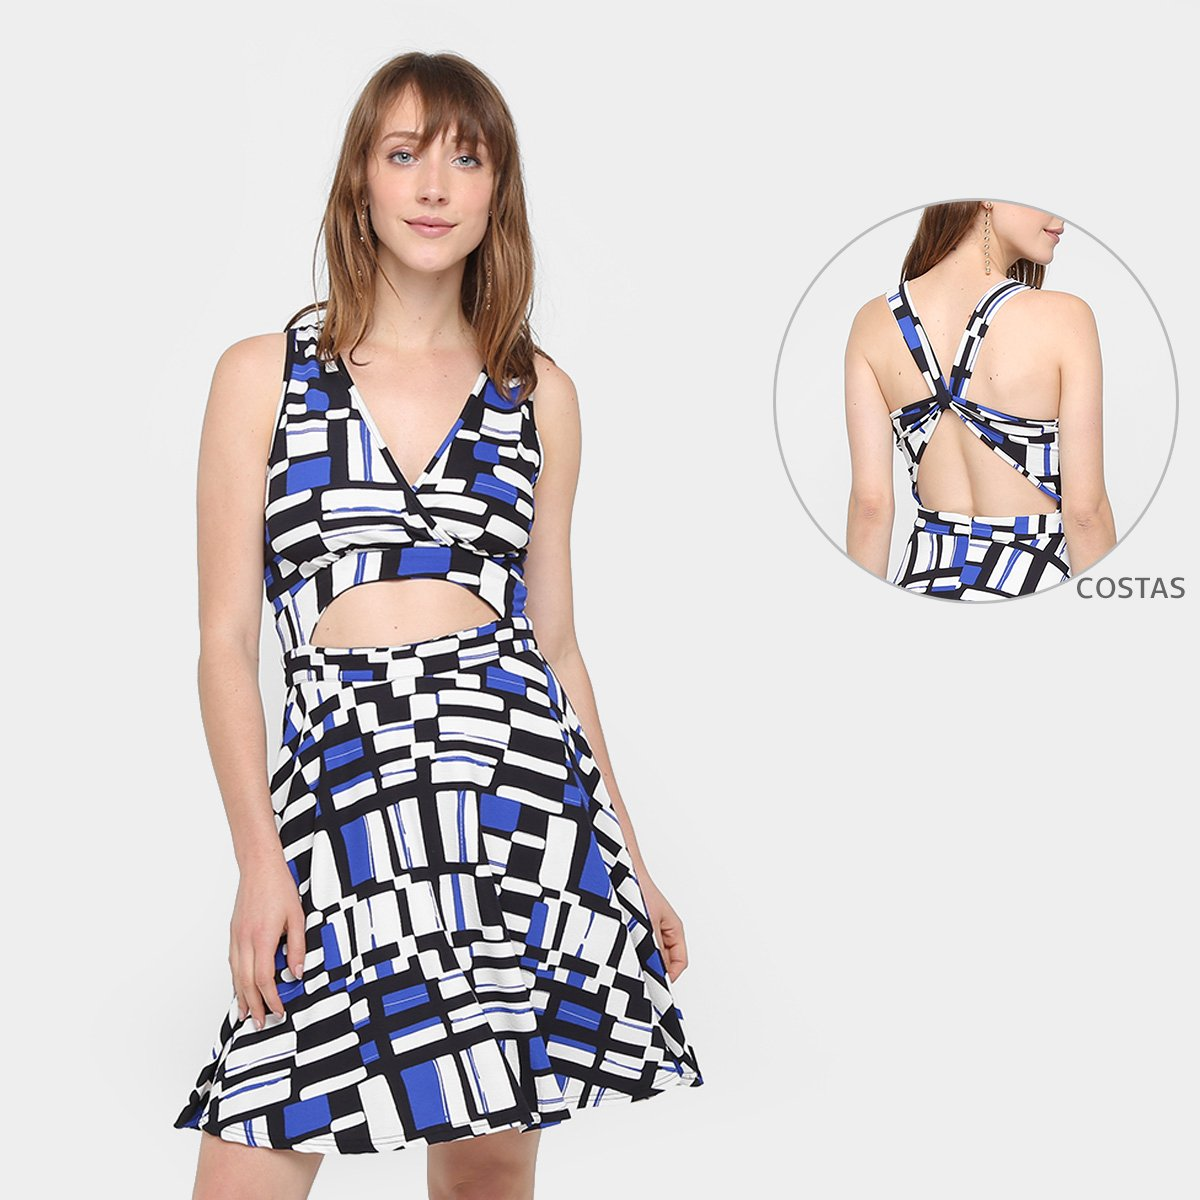 04ec07017 Vestido Top Moda Evasê Curto Estampado Feminino